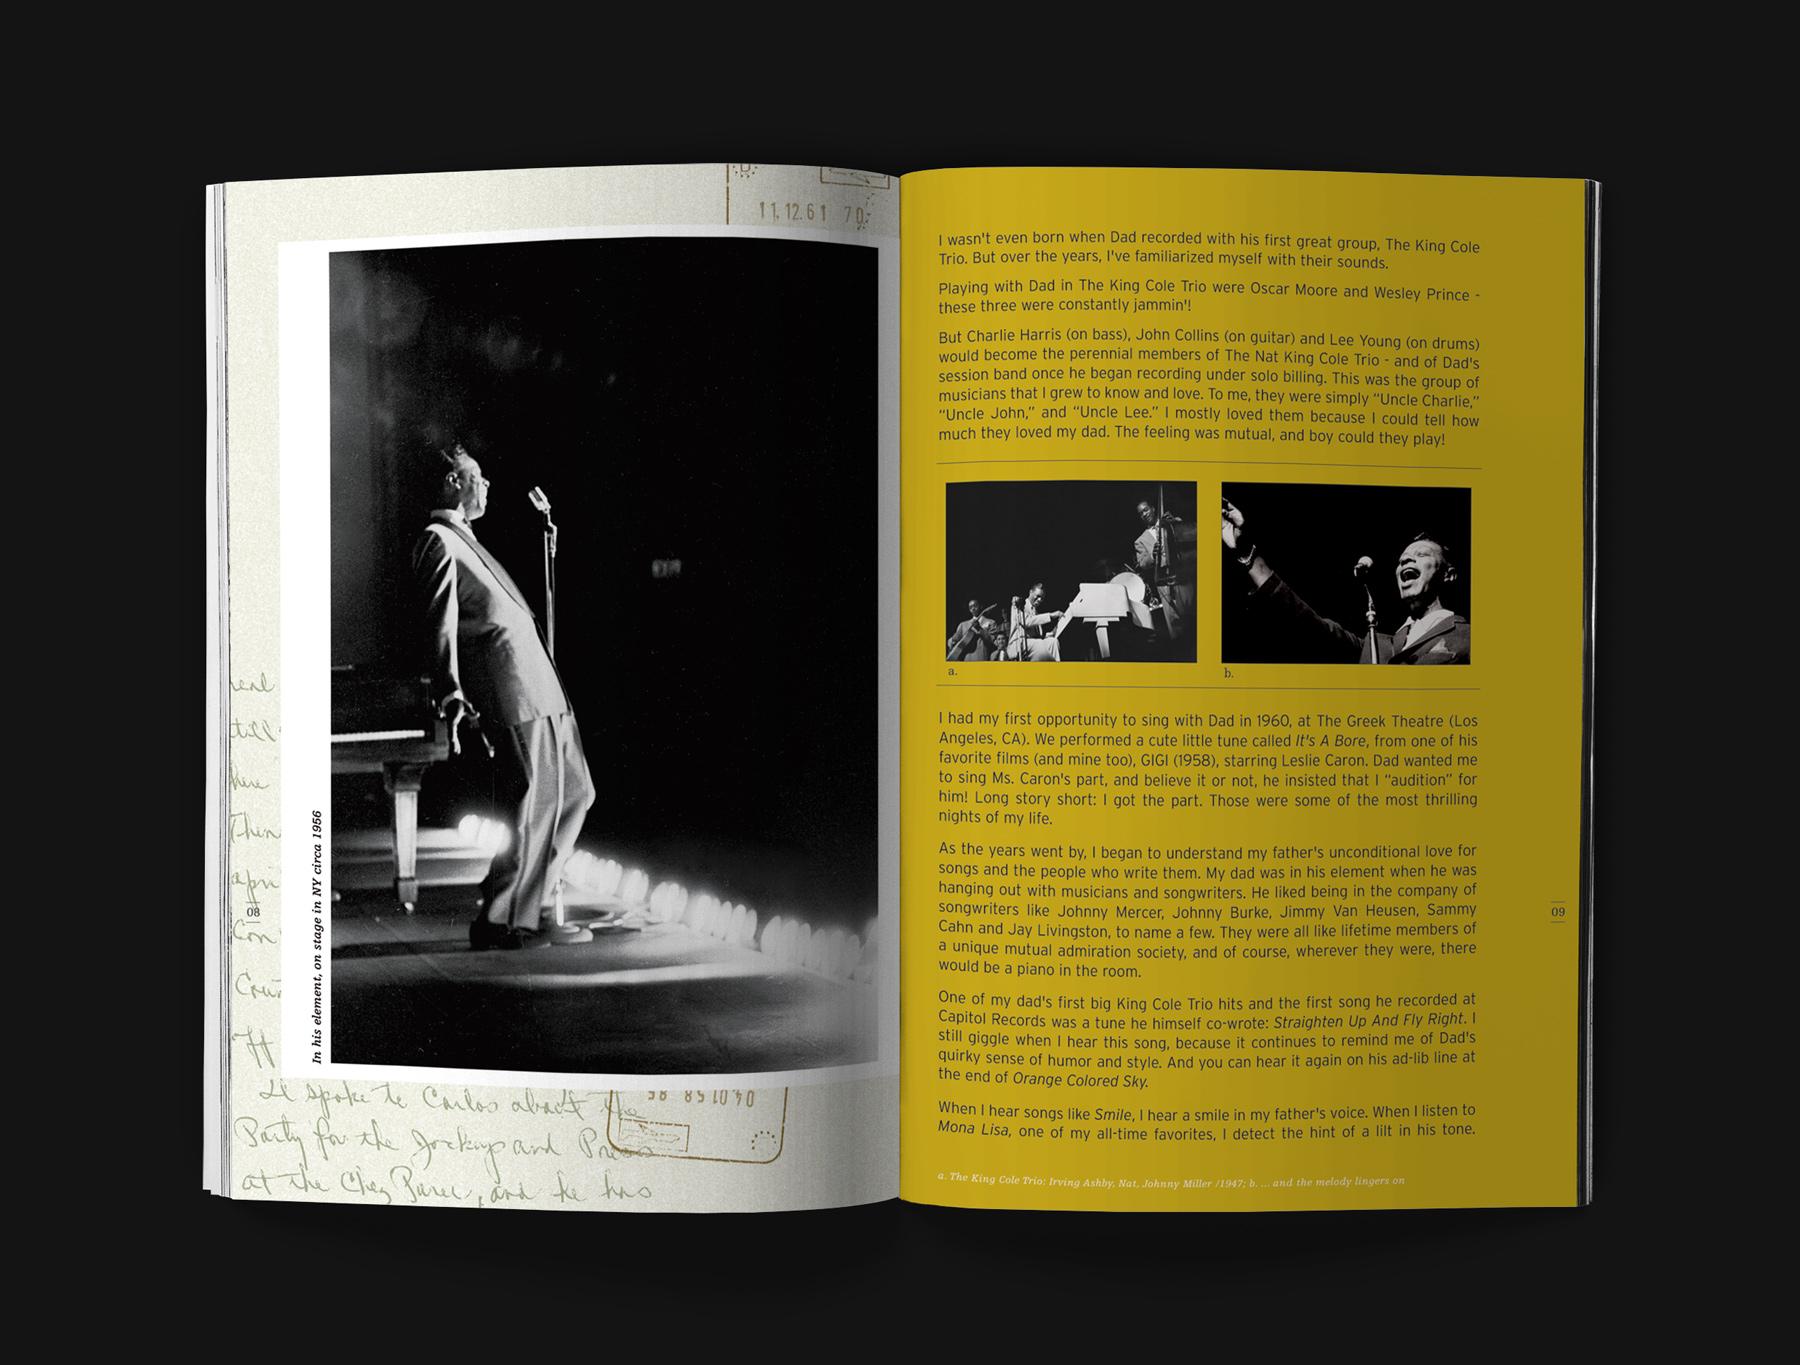 Nat_book7.jpg